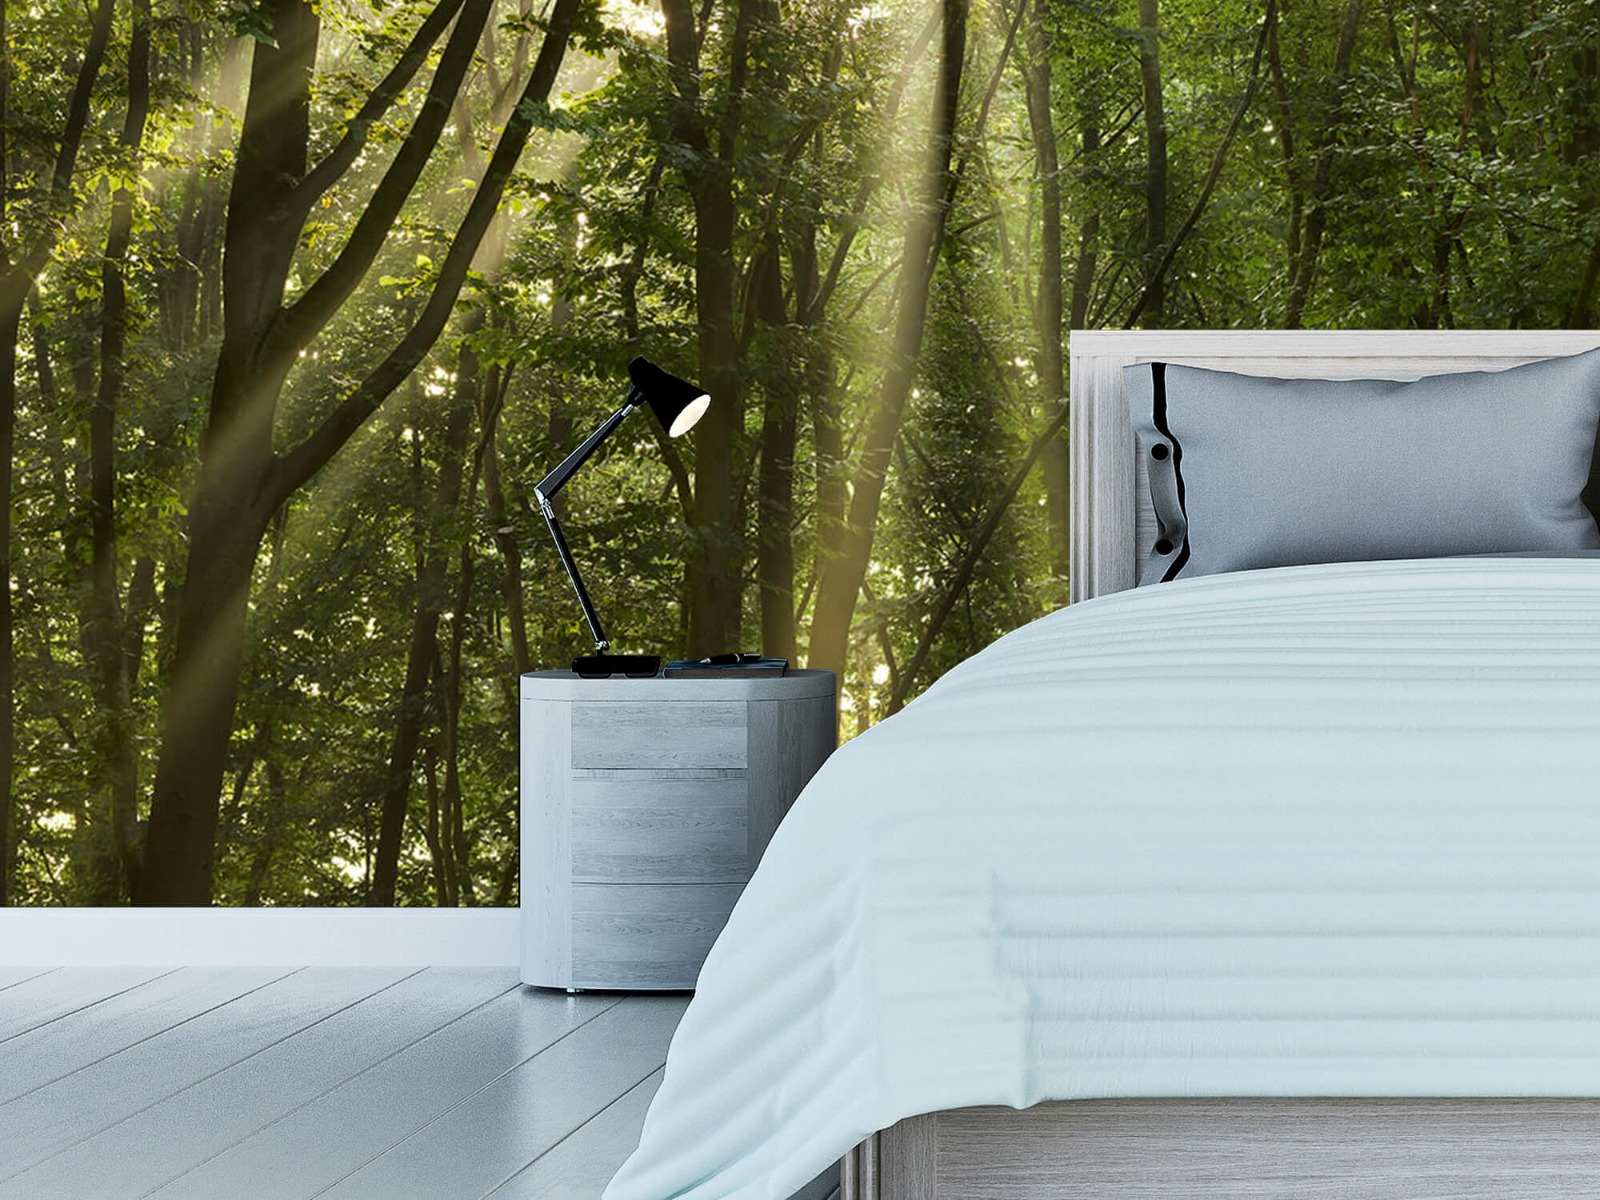 Bomen - Zonnestralen in het bos - Slaapkamer 12